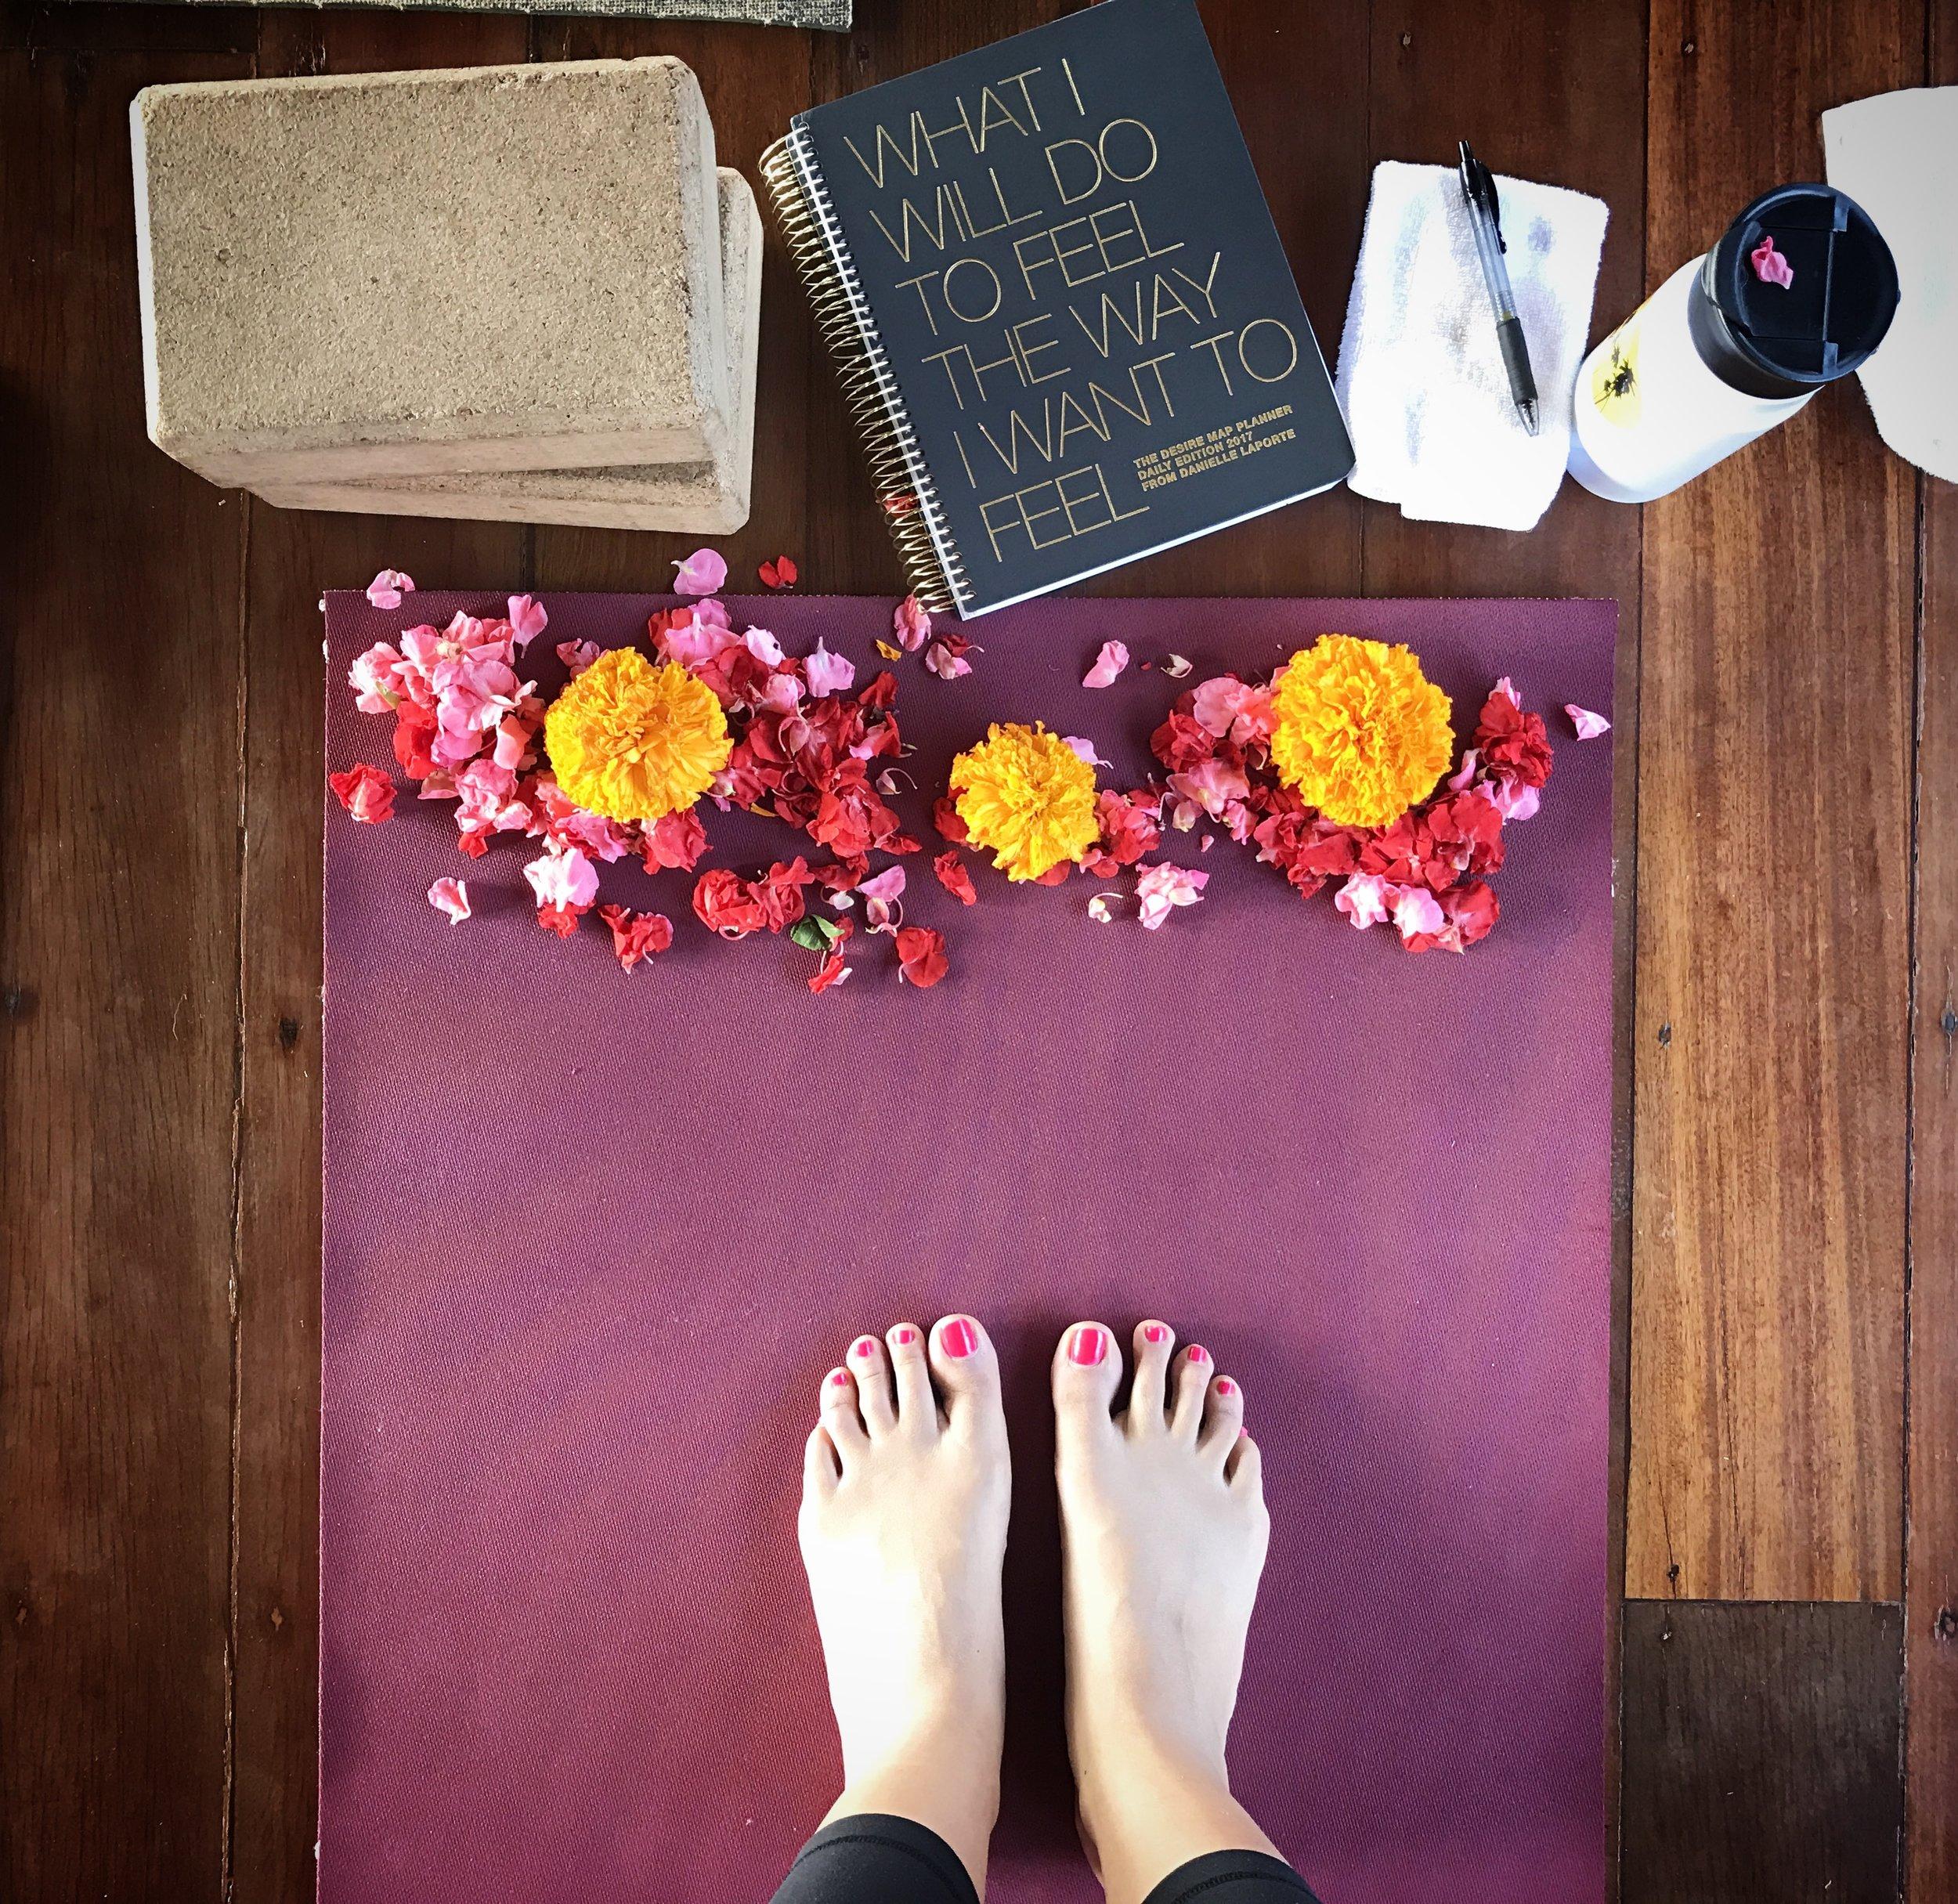 The #Be.Serve.Rock. Retreat - A week of transformation, adventure and play in Bali!Join Sara Agah Franti and Amanda Haas at Soulshine Bali for